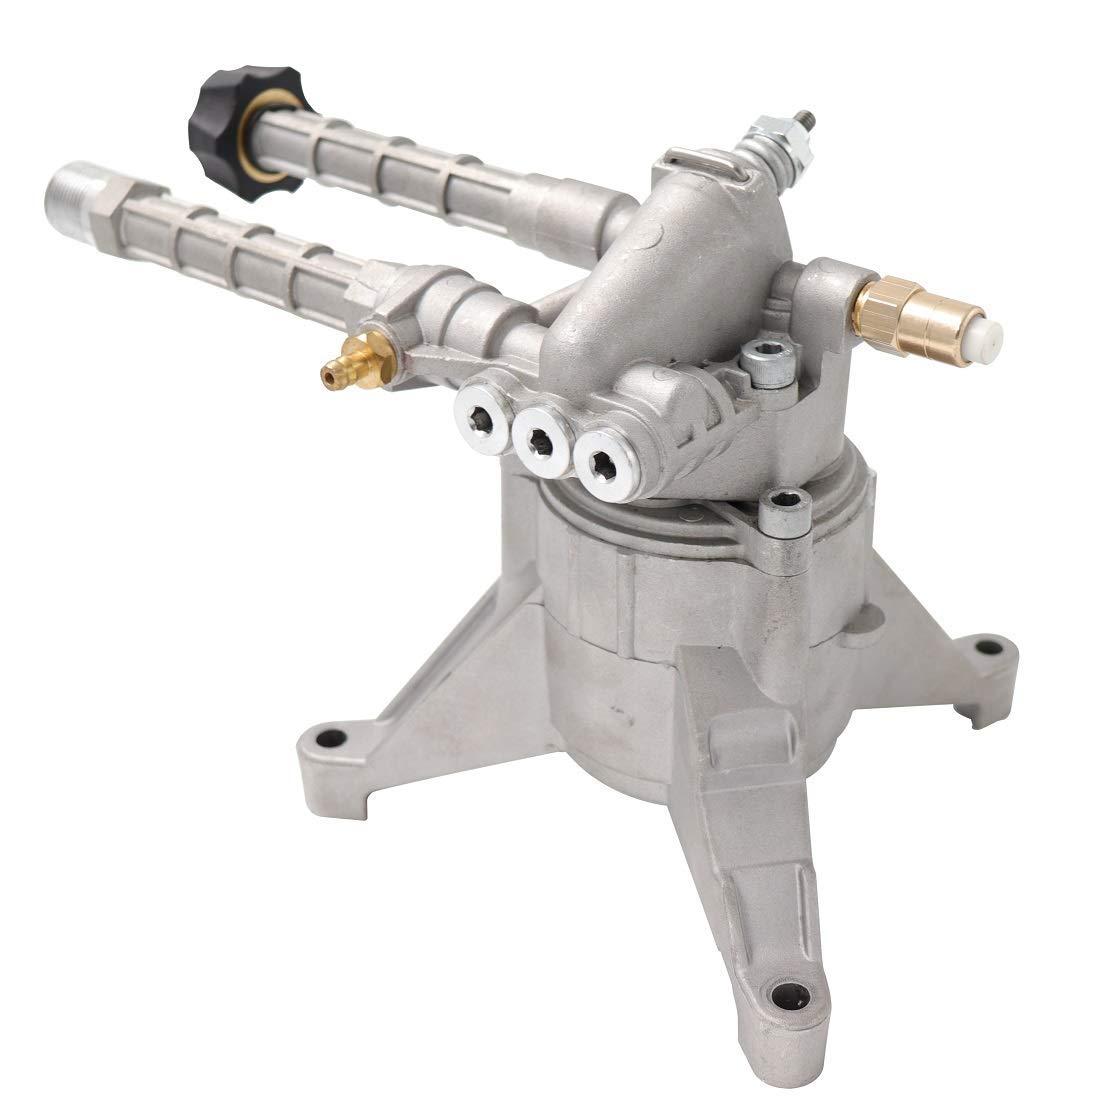 EDOU Gas Pressure Washer Pump Replacement 7/8'' Diameter Shaft Plunger Vertical Pump Axial Horizontal Pump Easy Start,2500 PSI 2.3 GPM